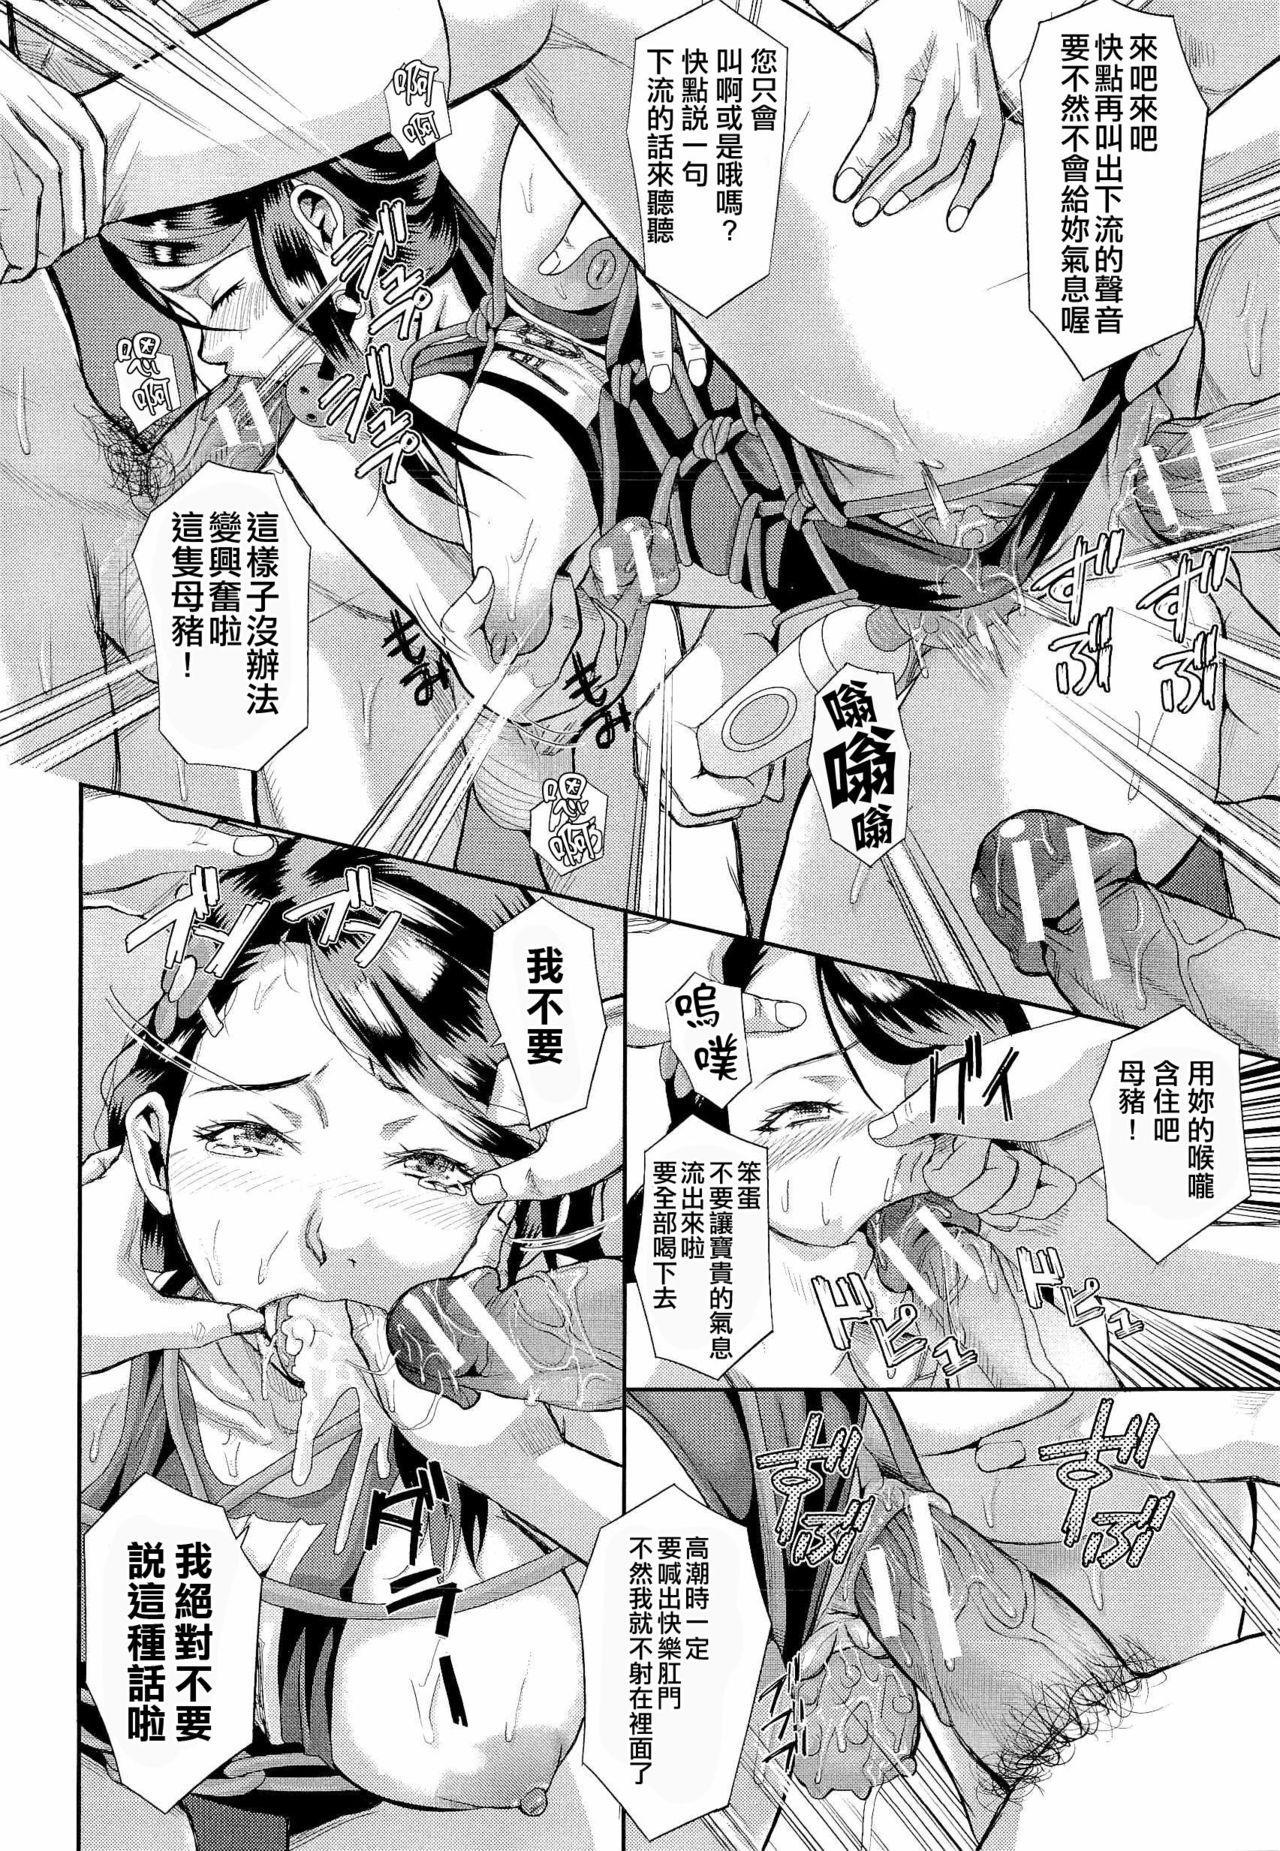 [Honebuto Danshaku] Innou Kaizou Program ~Oyako Zecchou Cult Ochi~ [Chinese]【不想记名重嵌--高质量图源】 74